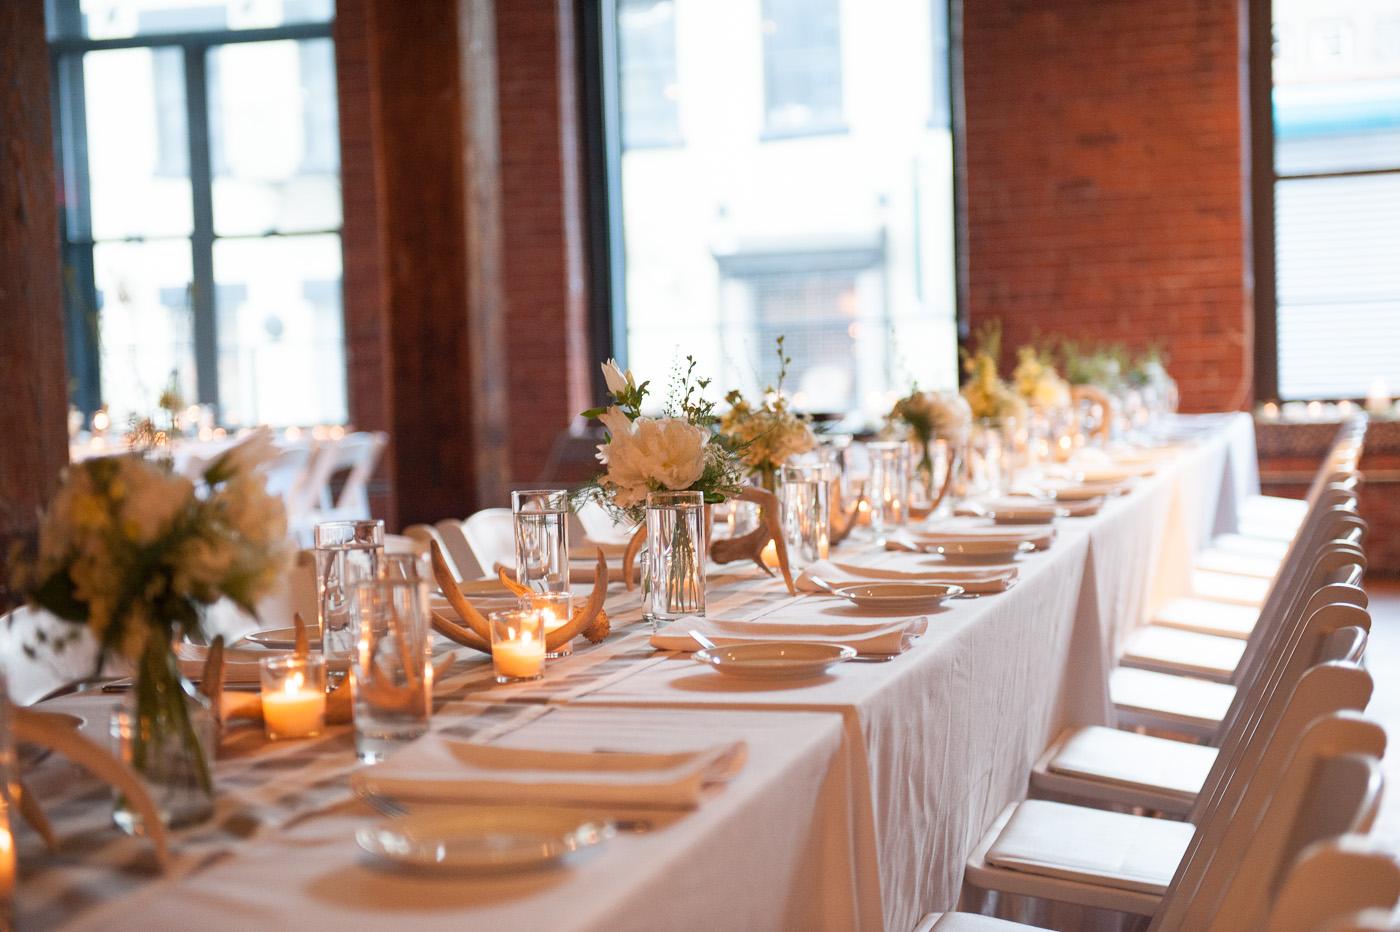 nyc-dumbo-loft-wedding-3.jpg